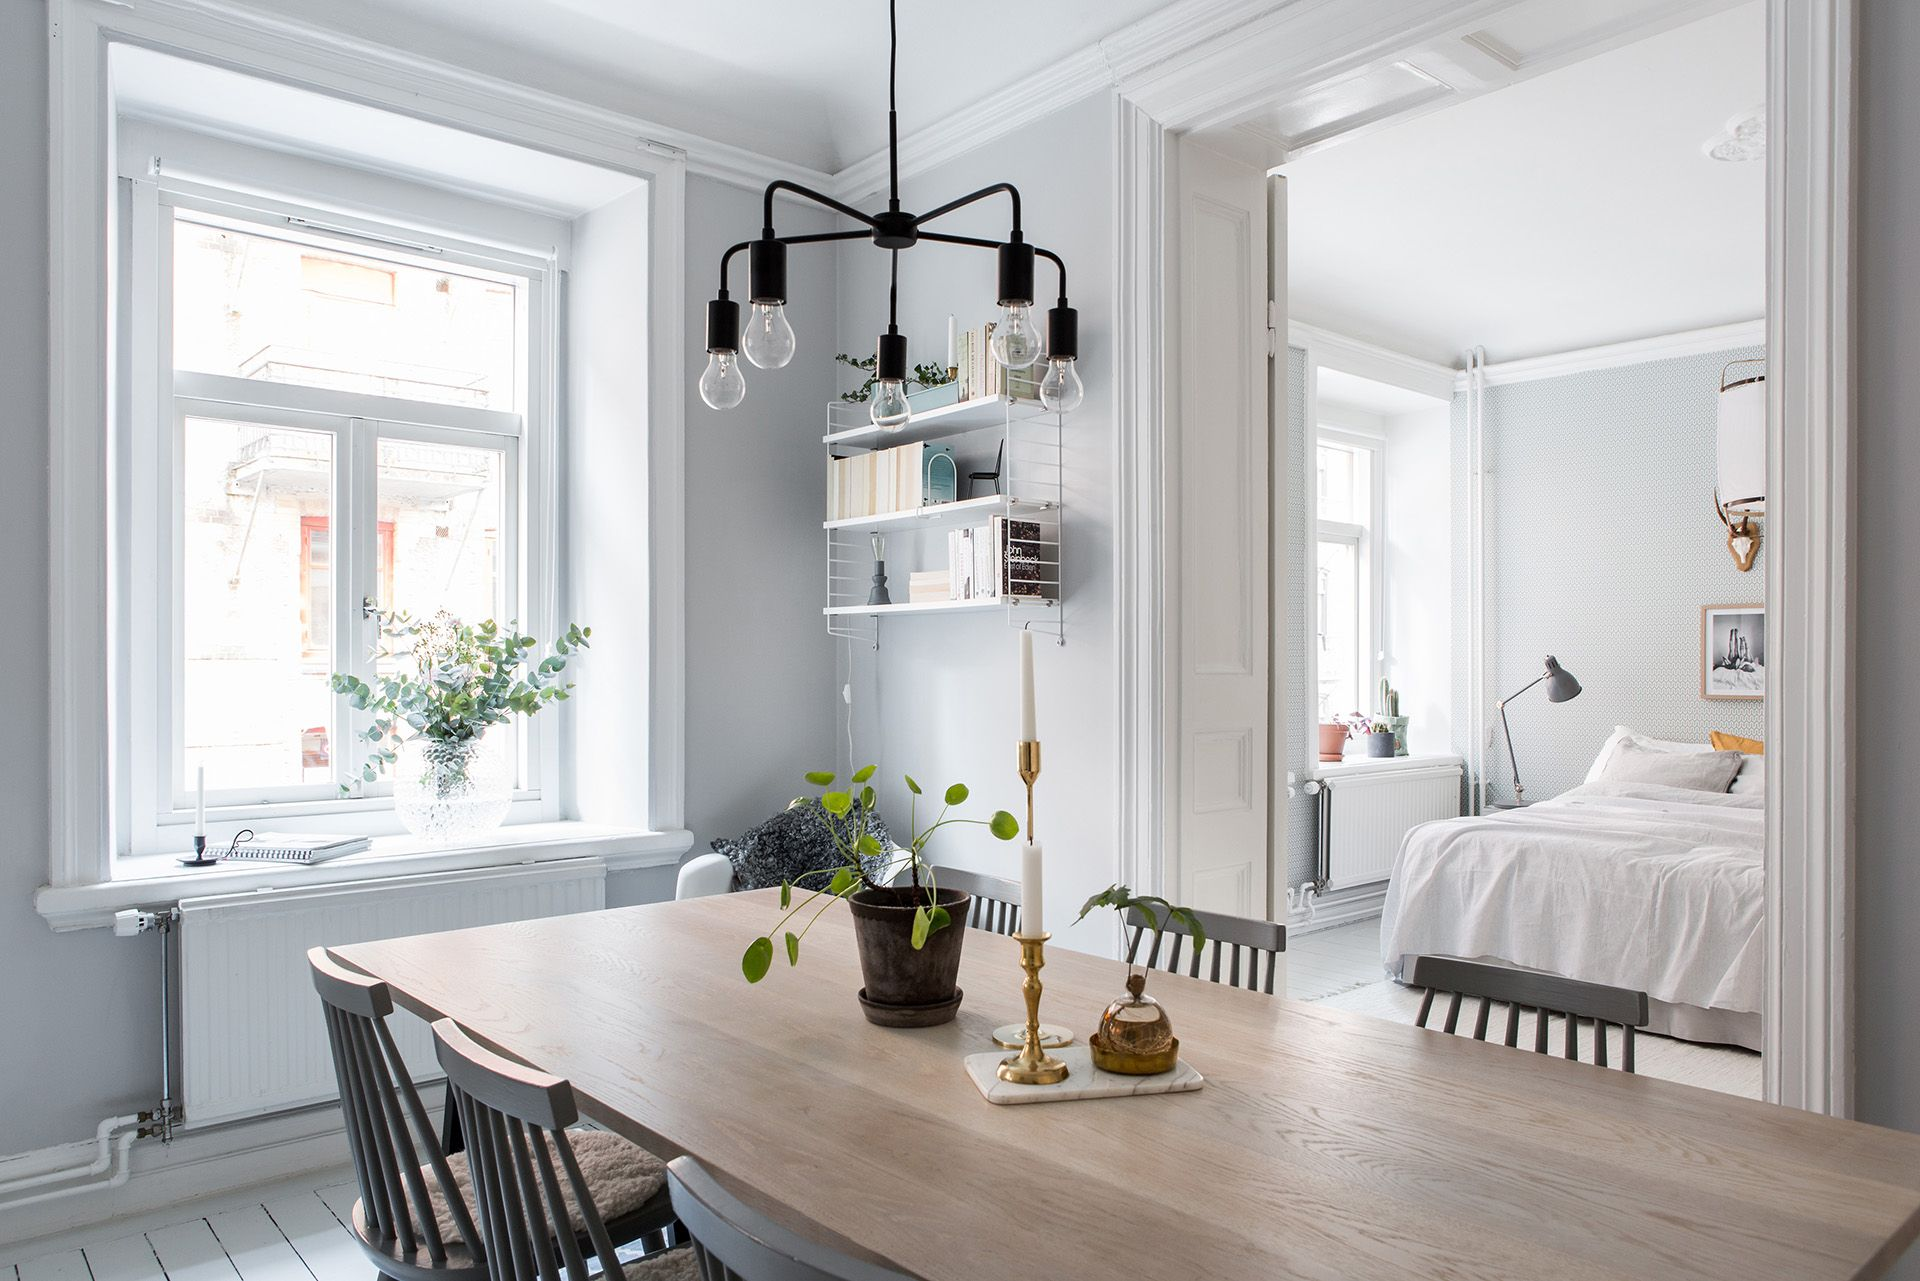 Nordhemsgatan 54 A   Houses 10   Pinterest   Dining, Interiors and House